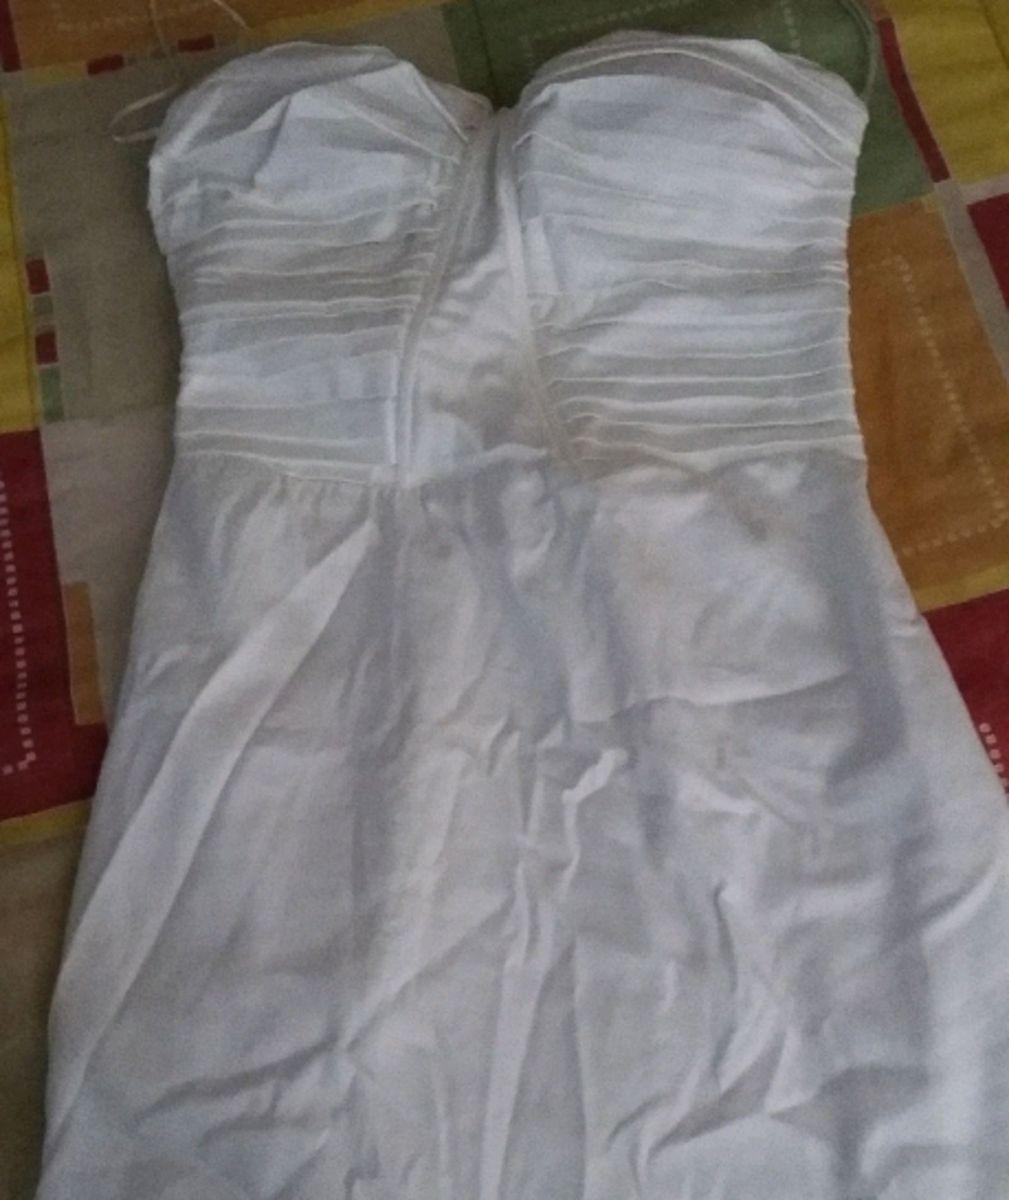 a2376b7fe394e vestido mcd - vestidos mcd.  Czm6ly9wag90b3muzw5qb2vplmnvbs5ici9wcm9kdwn0cy8ymdk2njcvodk5mje5ndlln2fhm2qxoda4ogvhyjm0zgi4mtezztiuanbn  ...